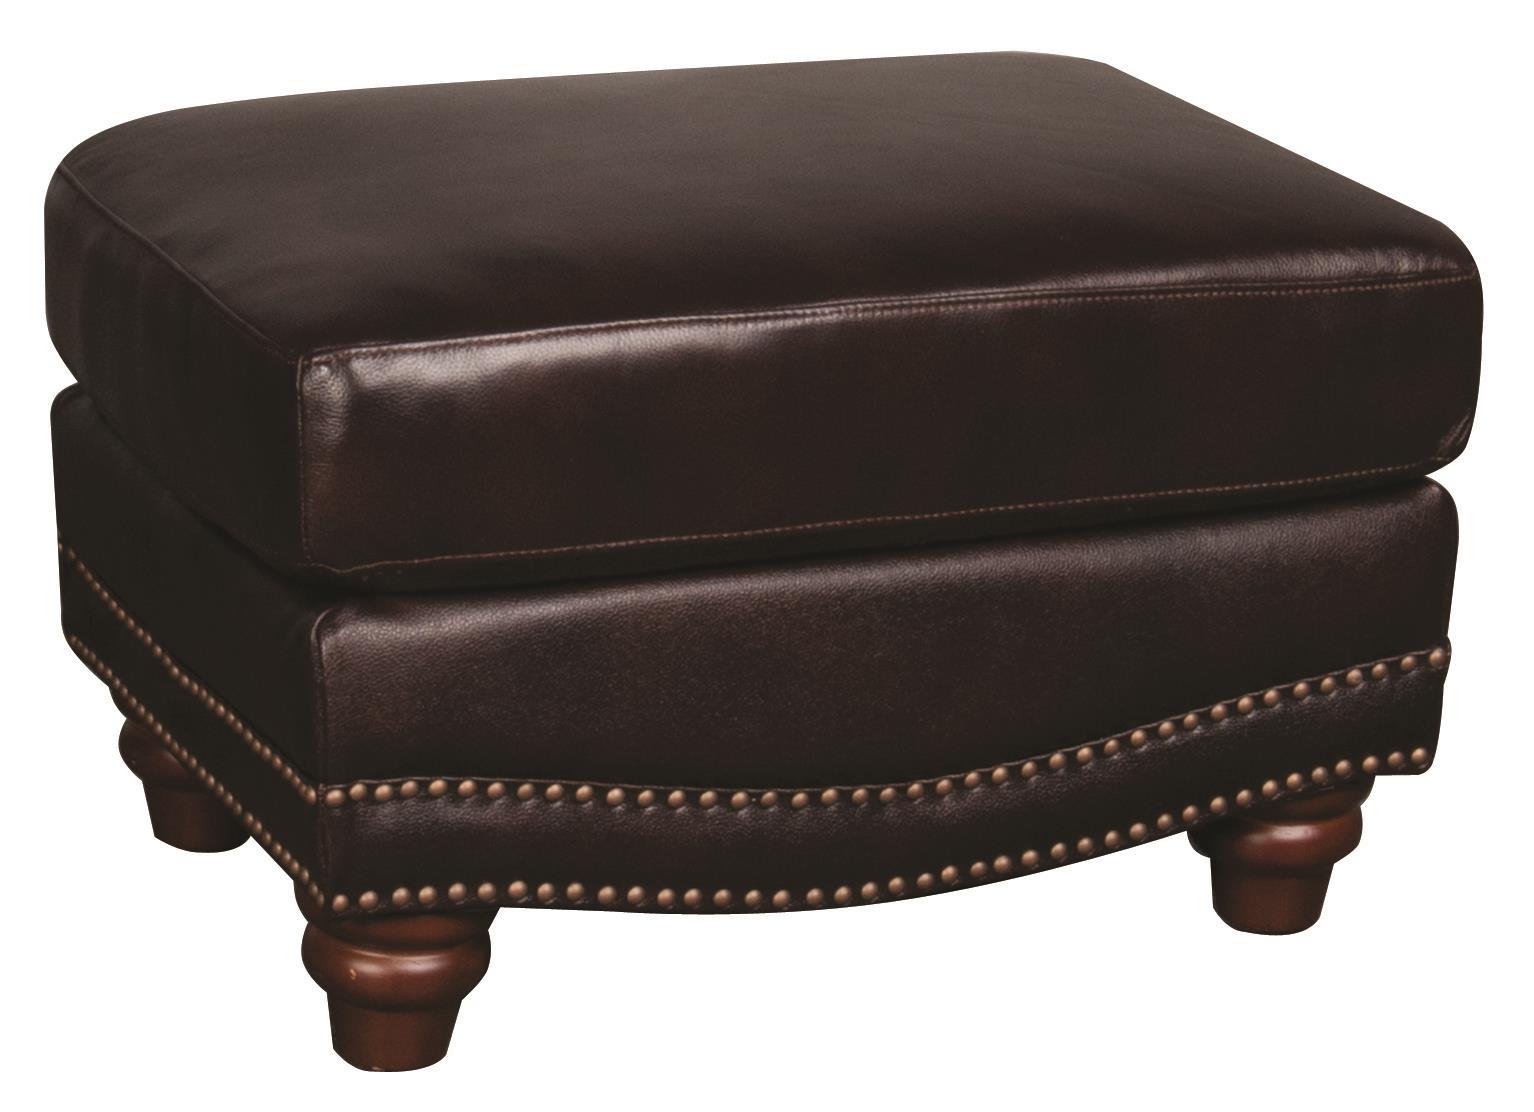 Morris Home Furnishings Amari Amari 100% Leather Ottoman - Item Number: 590399692